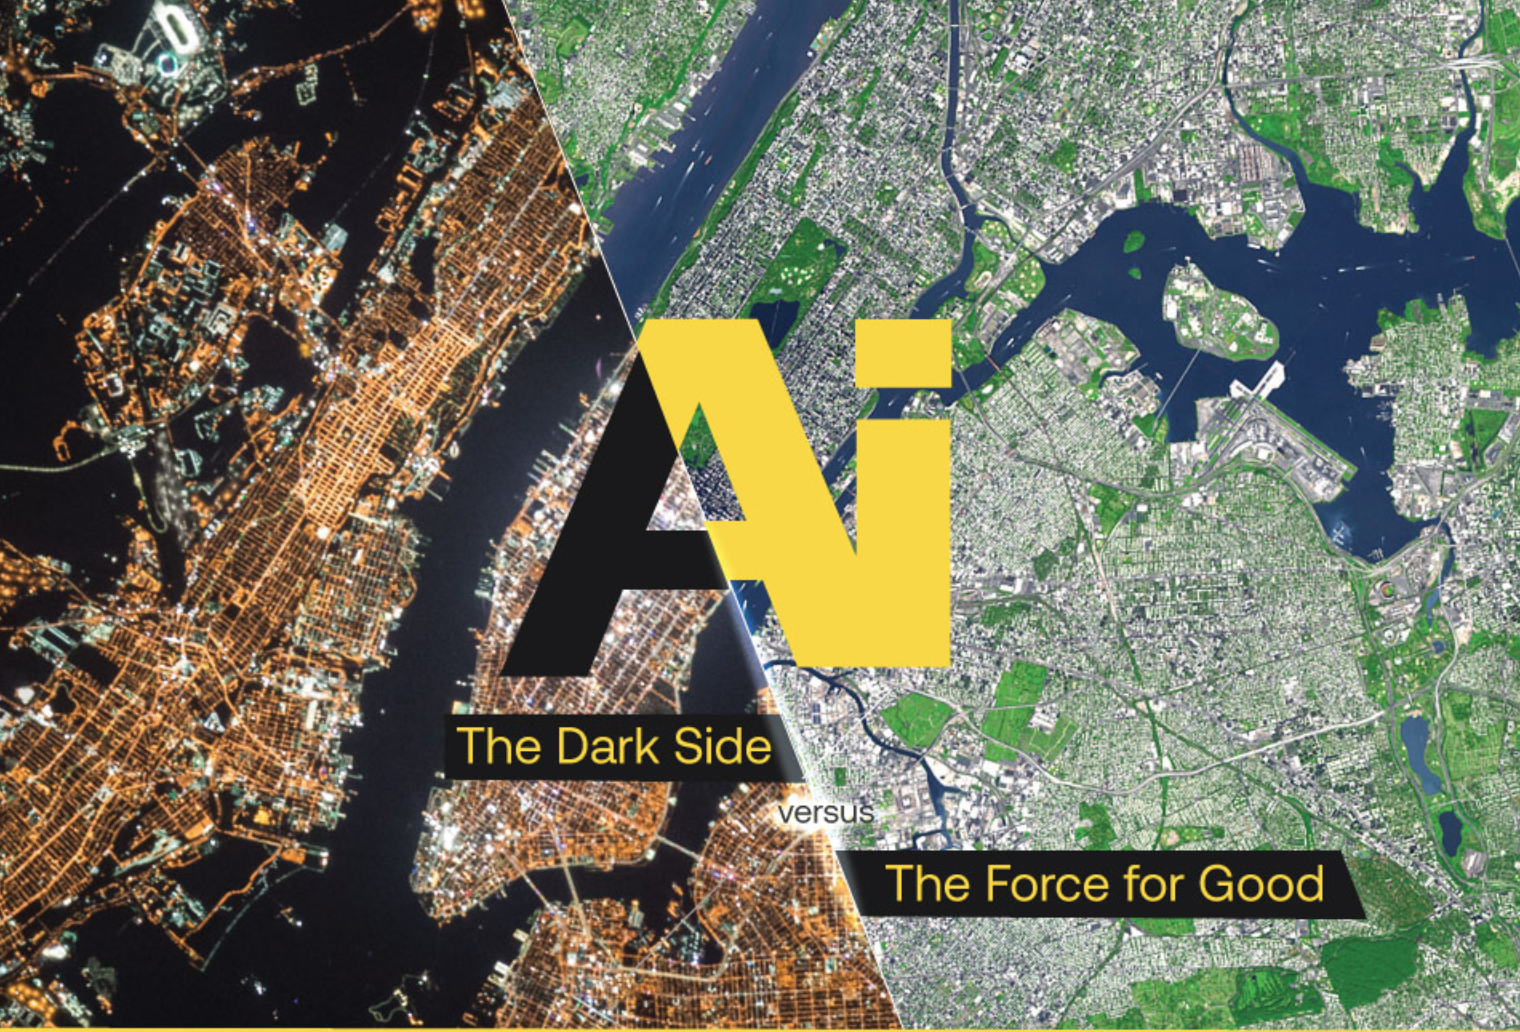 /the-future-is-now-ai-for-evil-vs-ai-for-good-8e87093b148 feature image